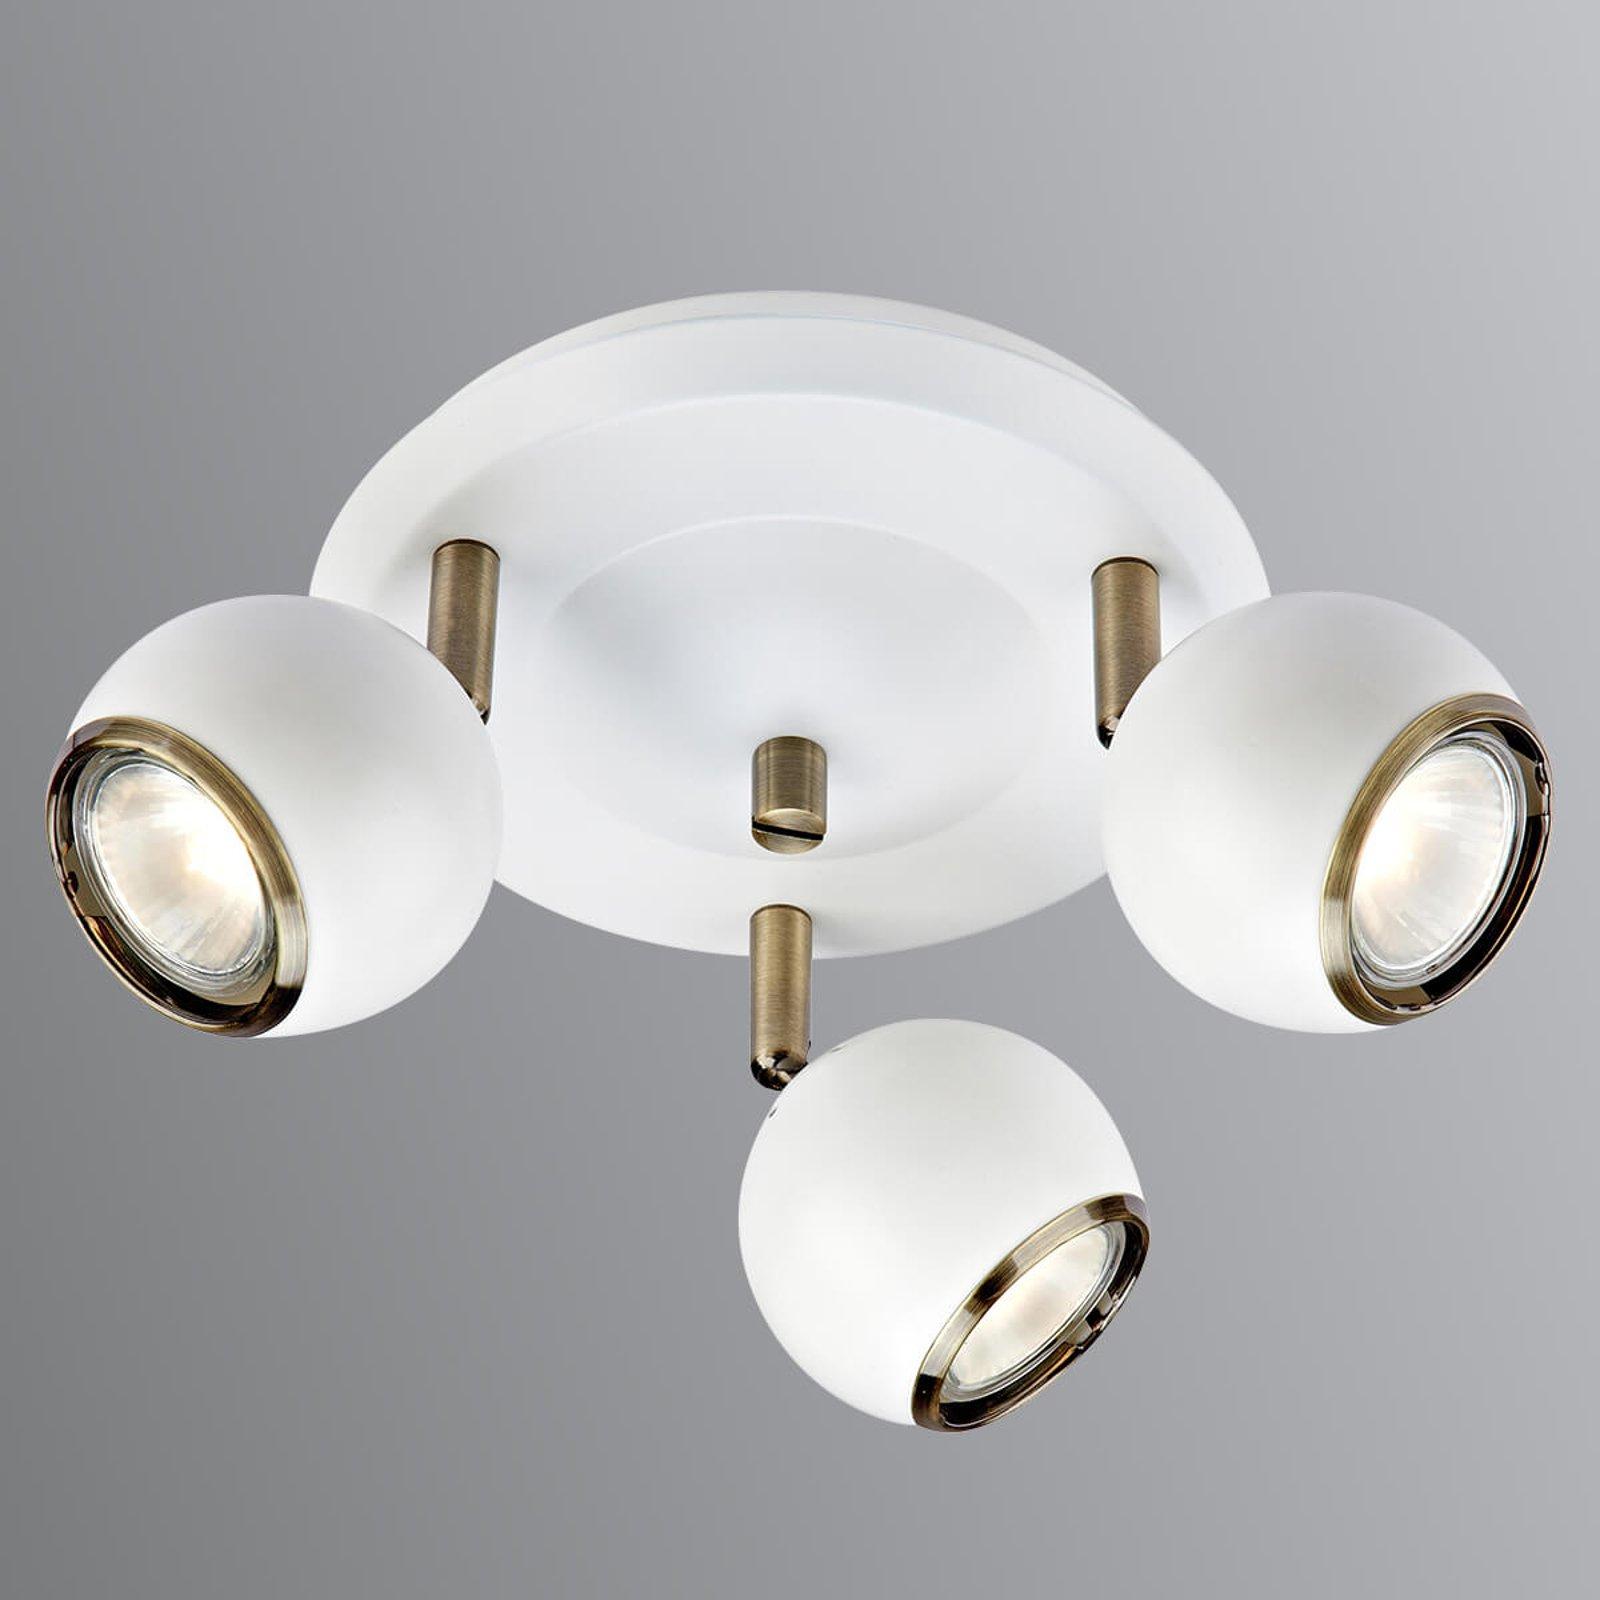 Coco - sirkelformet takspot i hvitt, tre lys